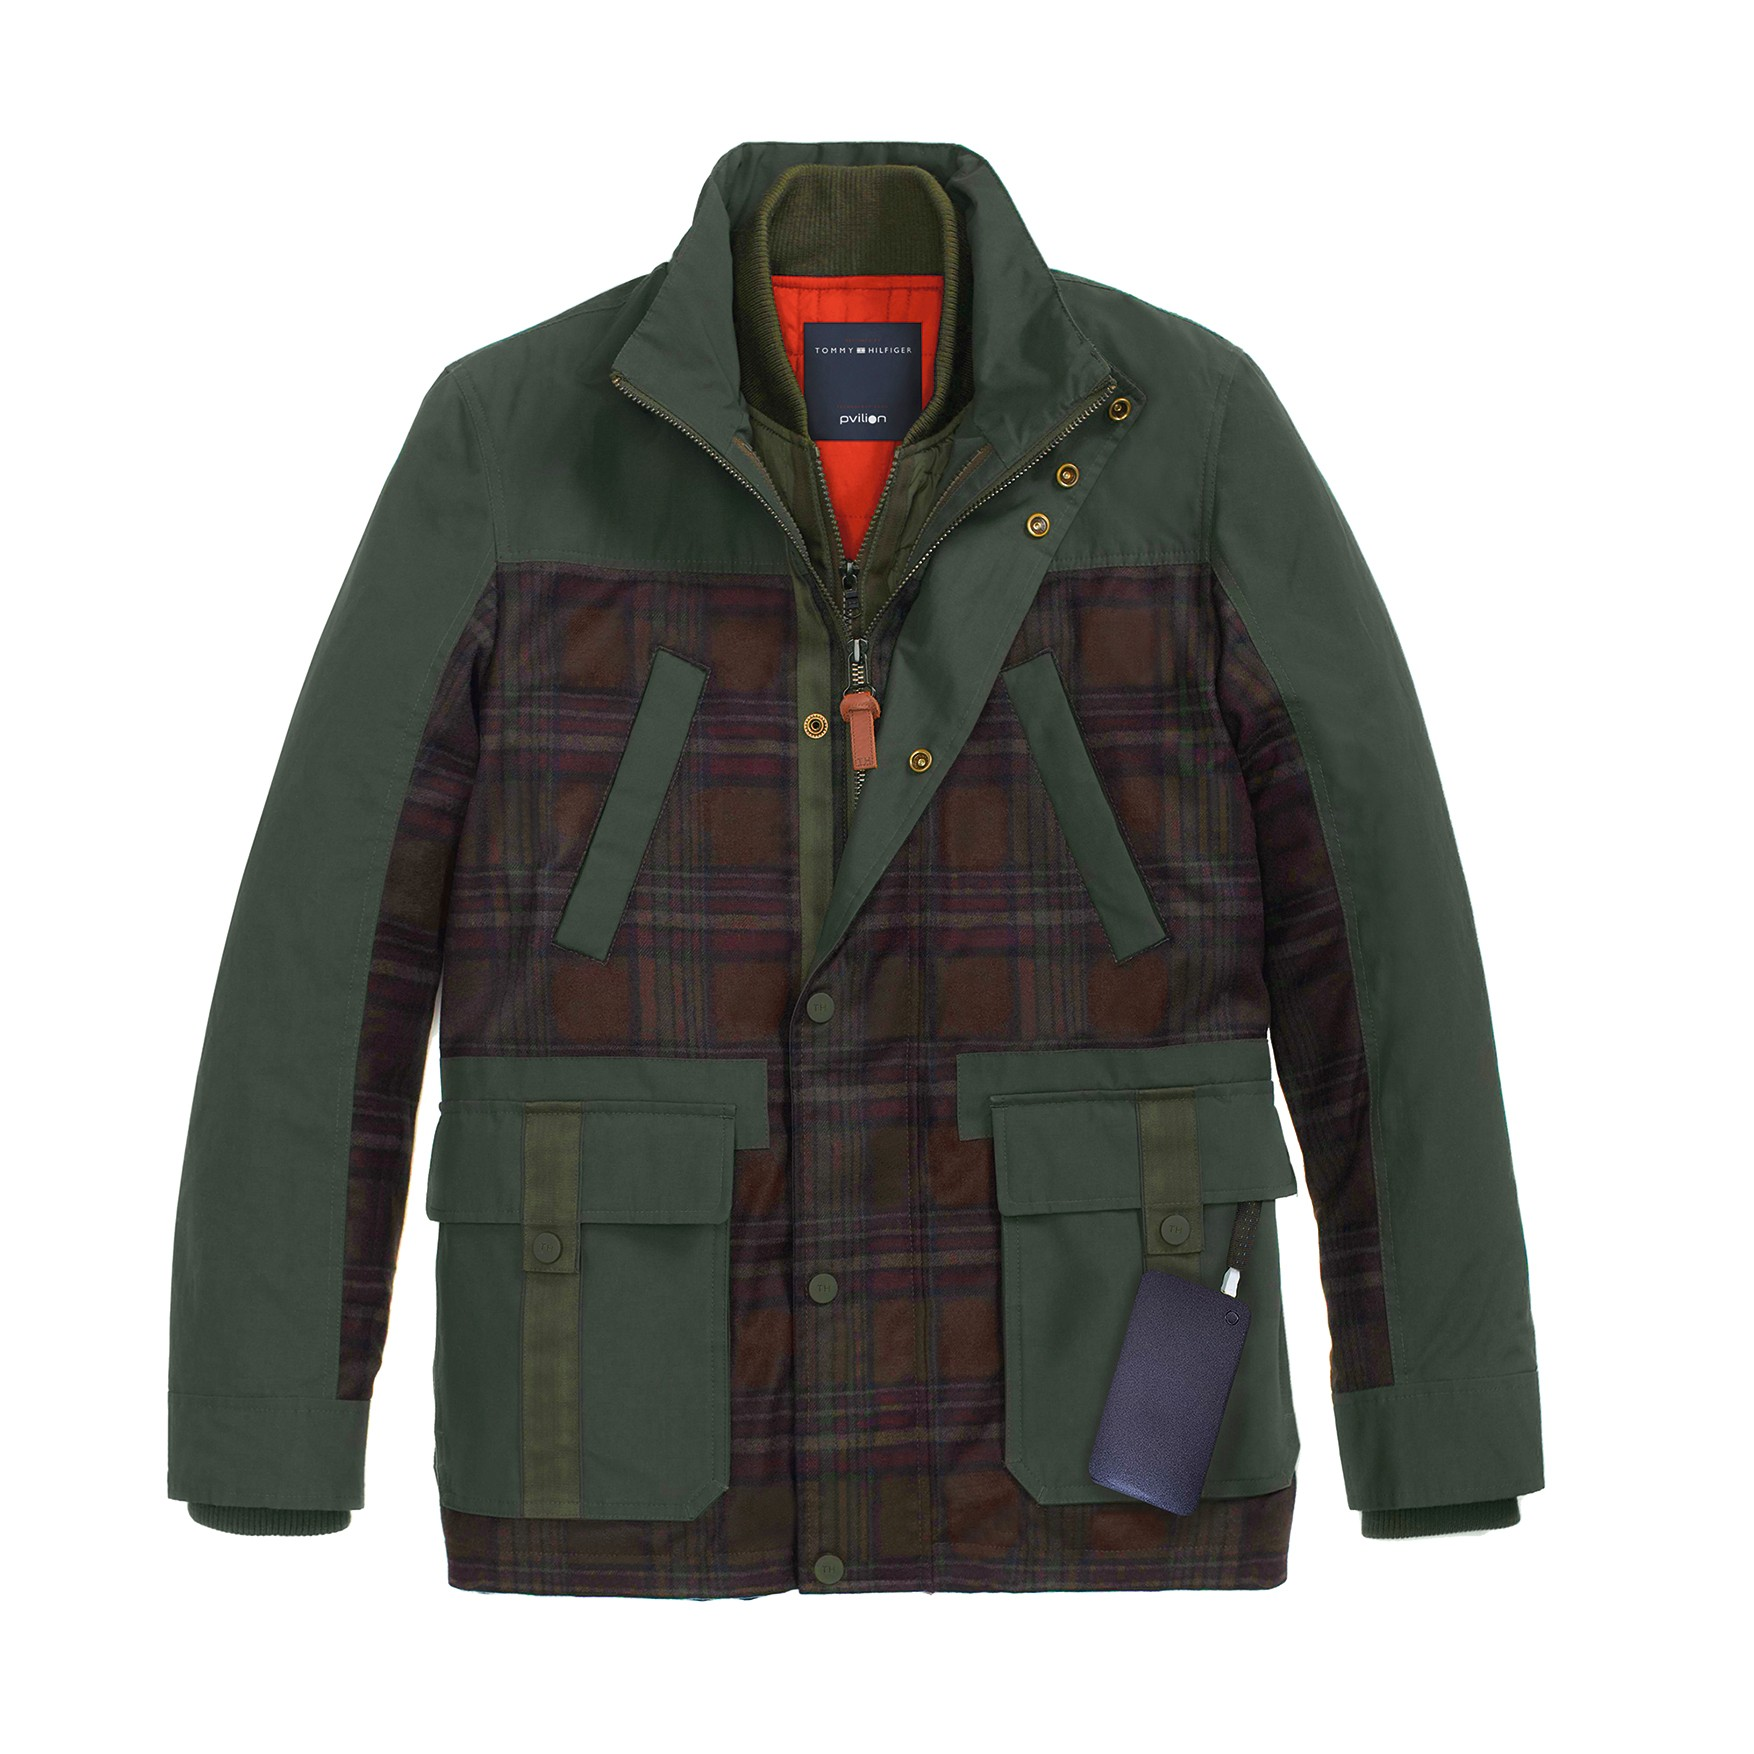 tommy hilfiger lan a jaqueta que carrega aparelhos eletr nicos gq estilo. Black Bedroom Furniture Sets. Home Design Ideas